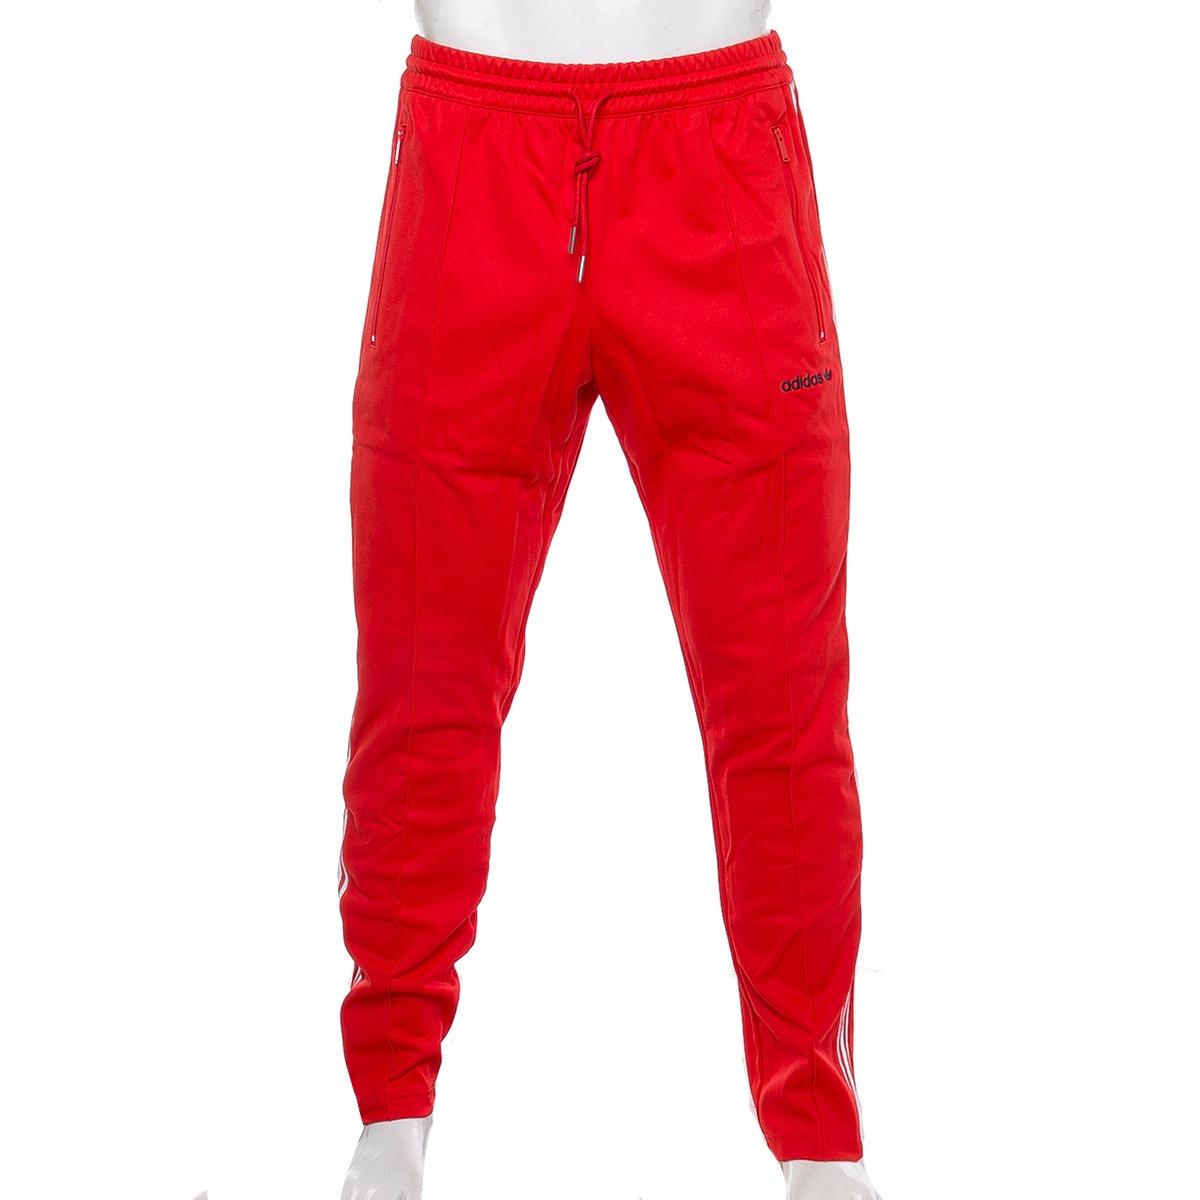 Originals Block Tienda Pantalon Adidas Oficial ED2IY9HW